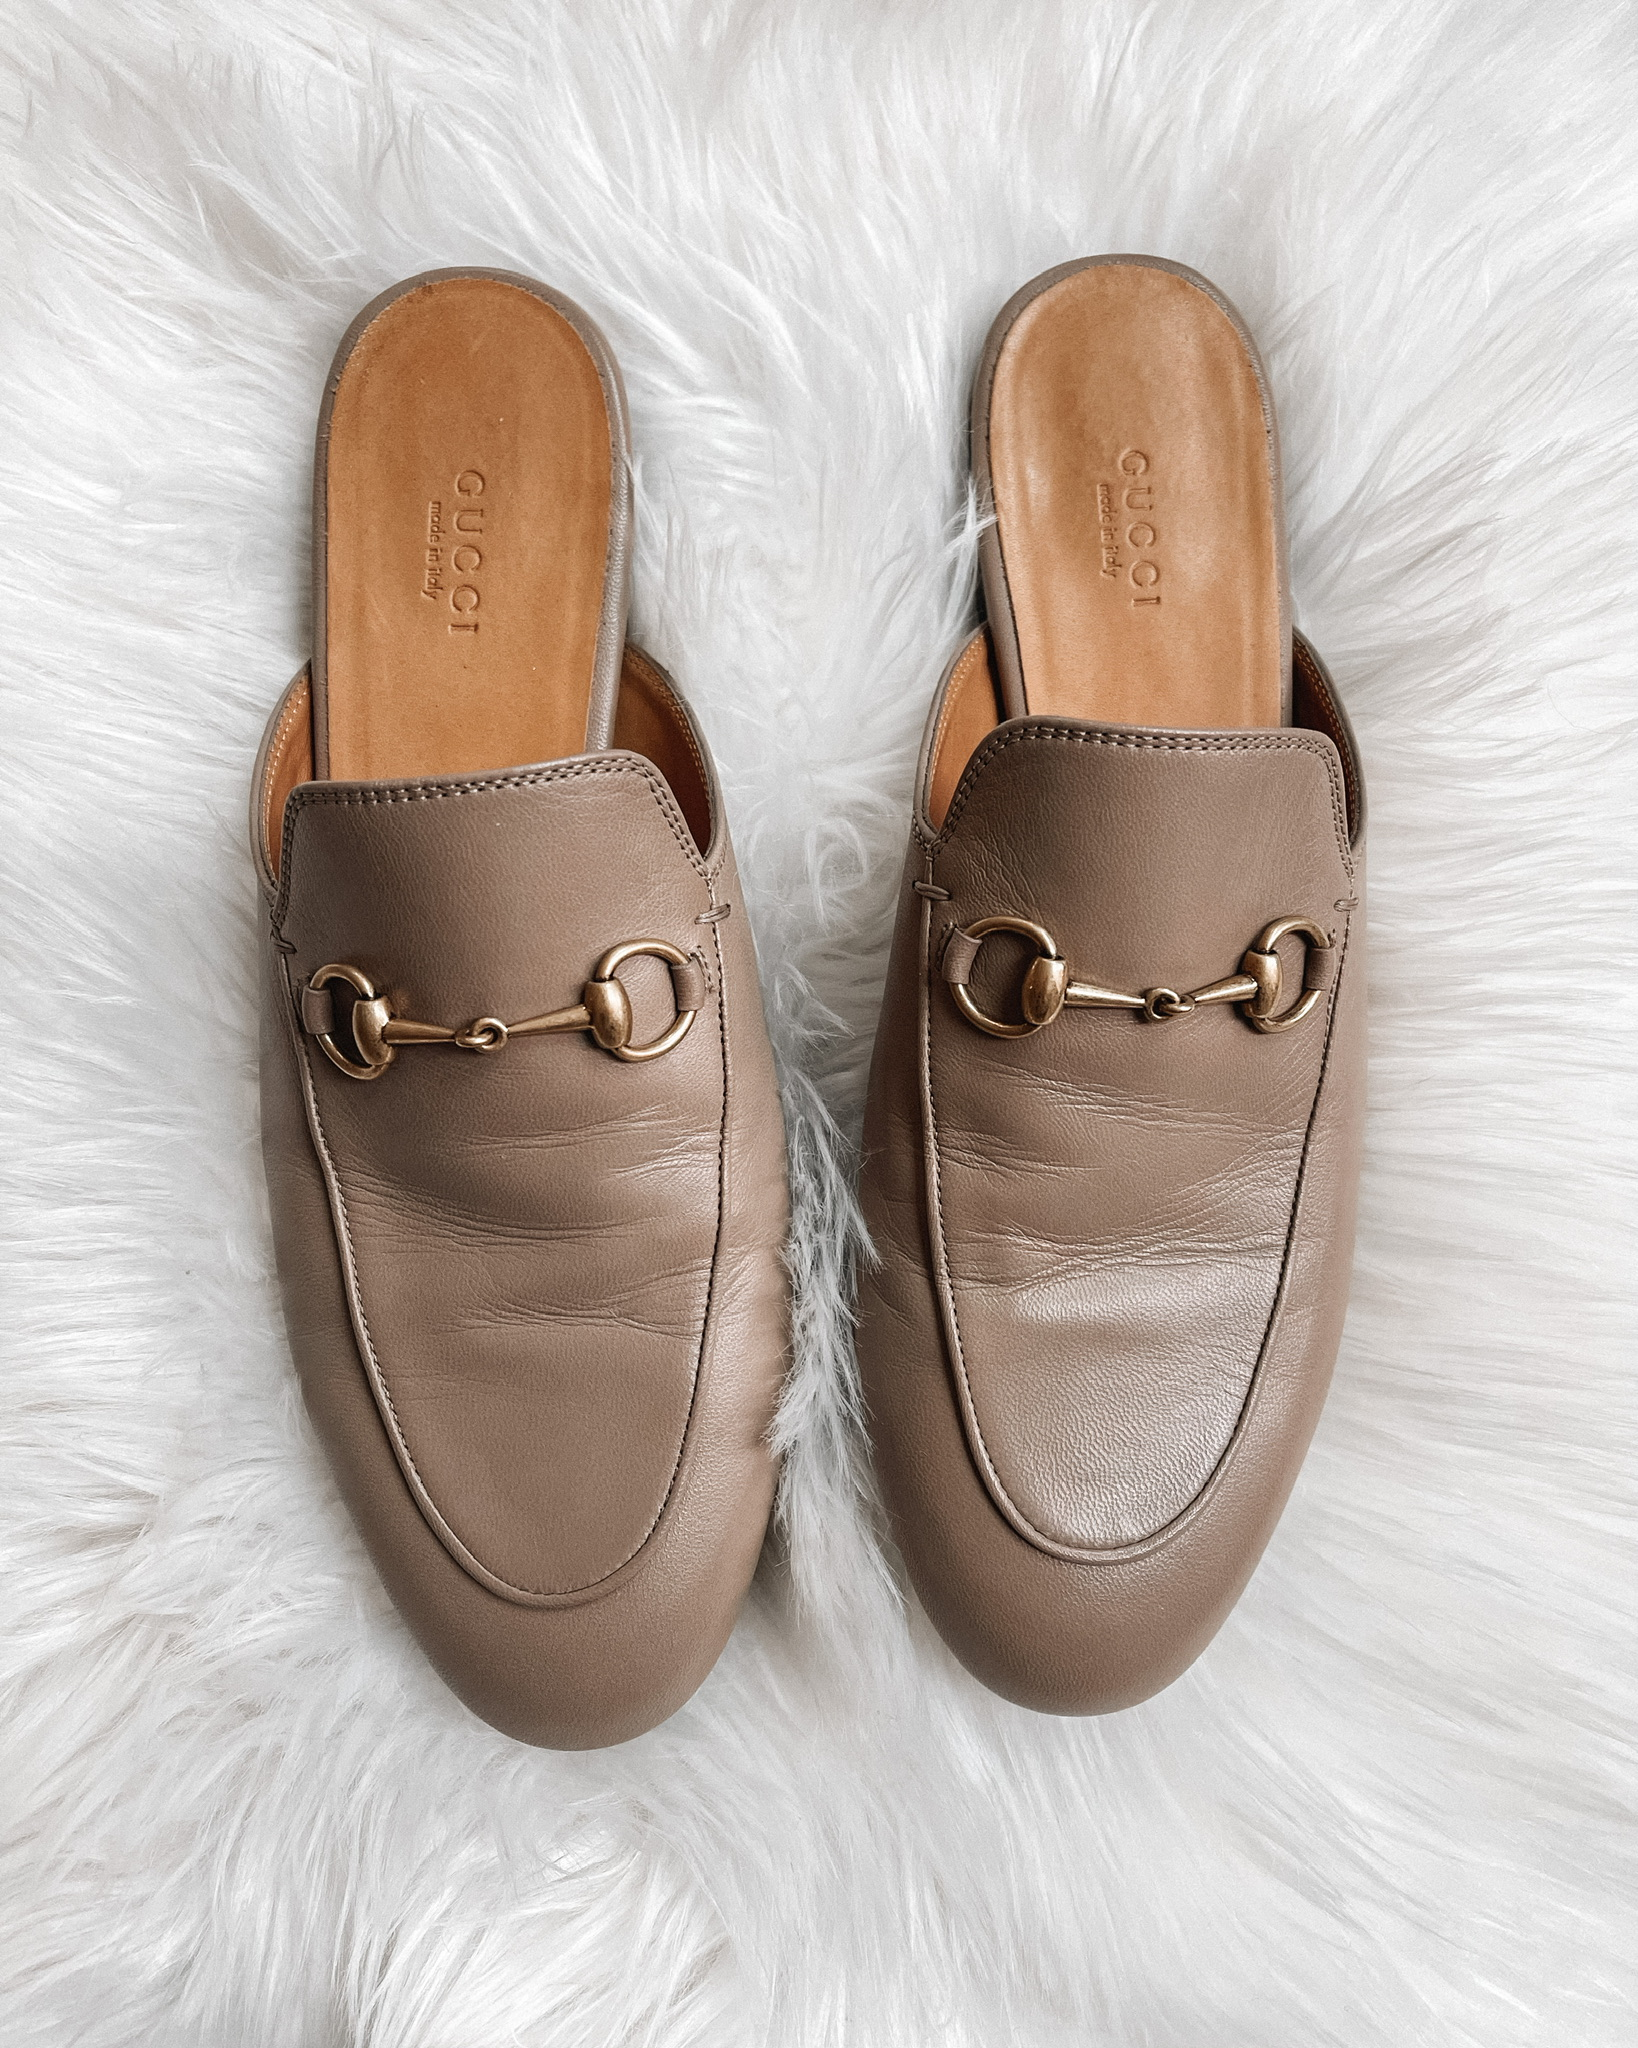 Fashion Jackson Gucci Princetown Mules Mud